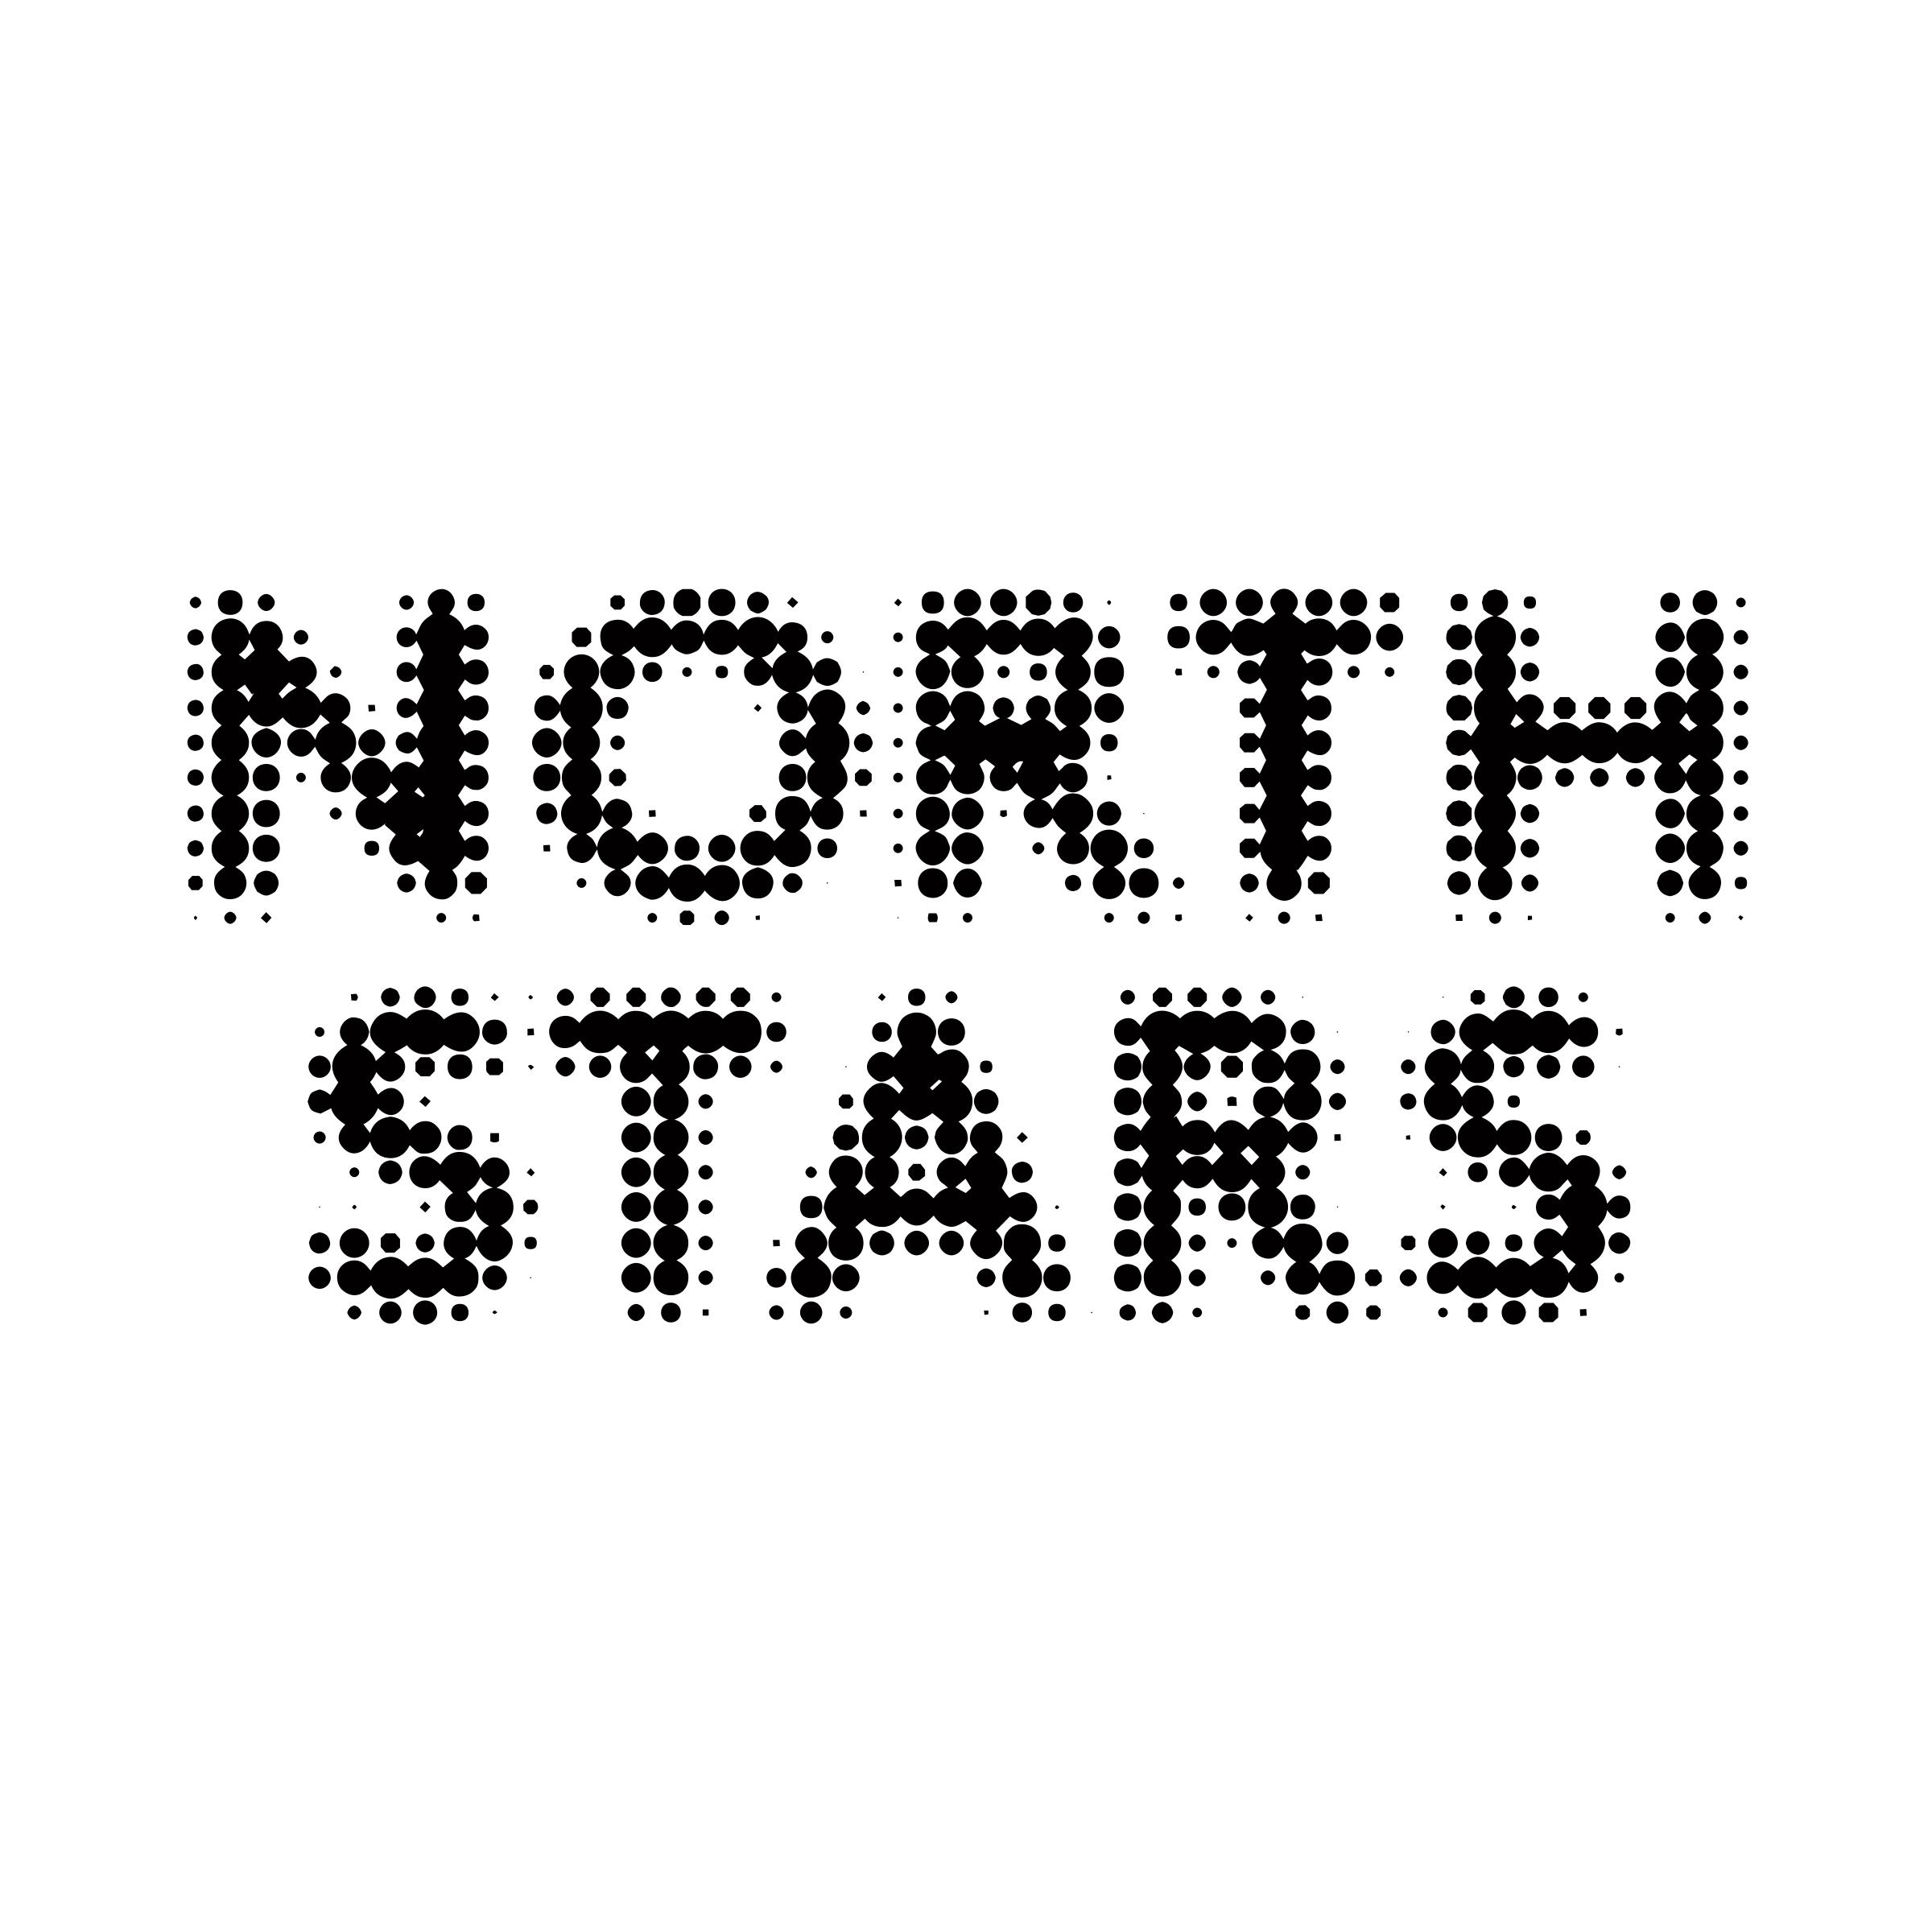 Yazmin_Monet_Butcher_Refinery29_NorthStars.png